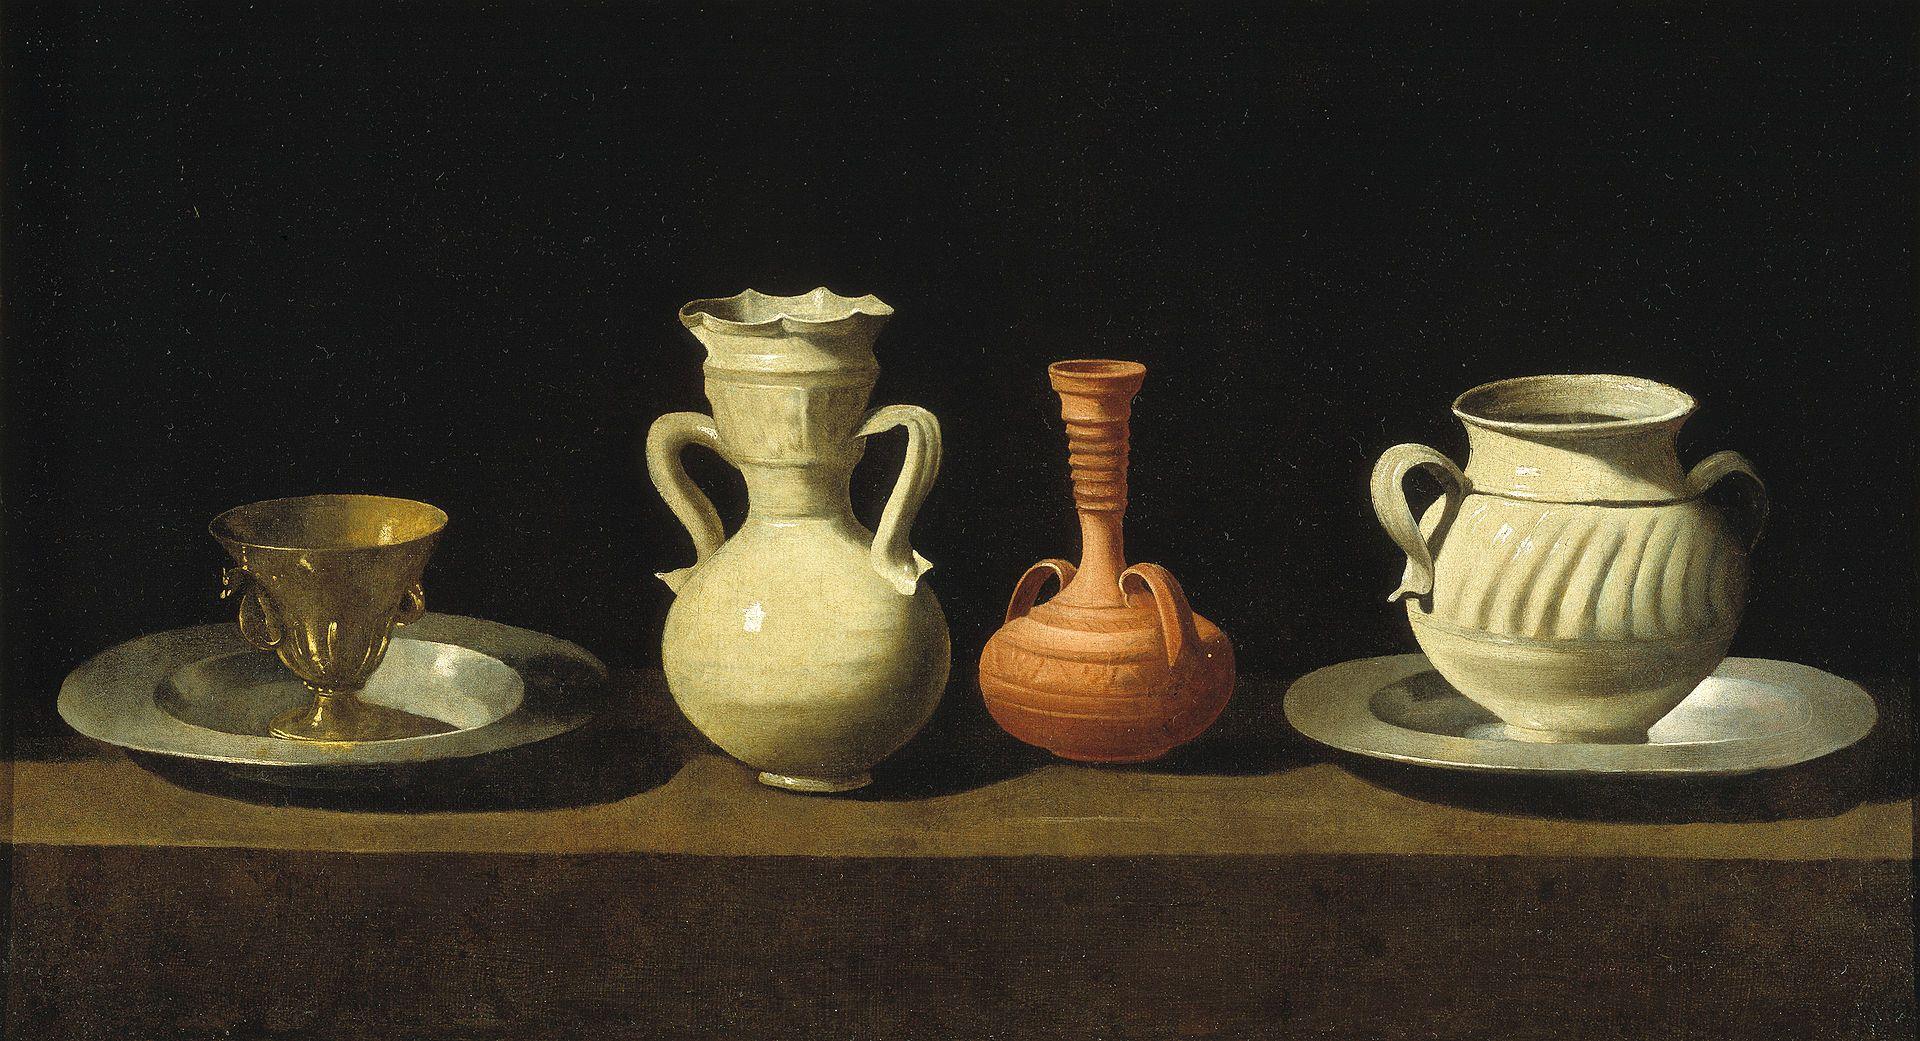 Bodegón de recipientes (Zurbarán) - Испанская живопись XVII века — Википедия